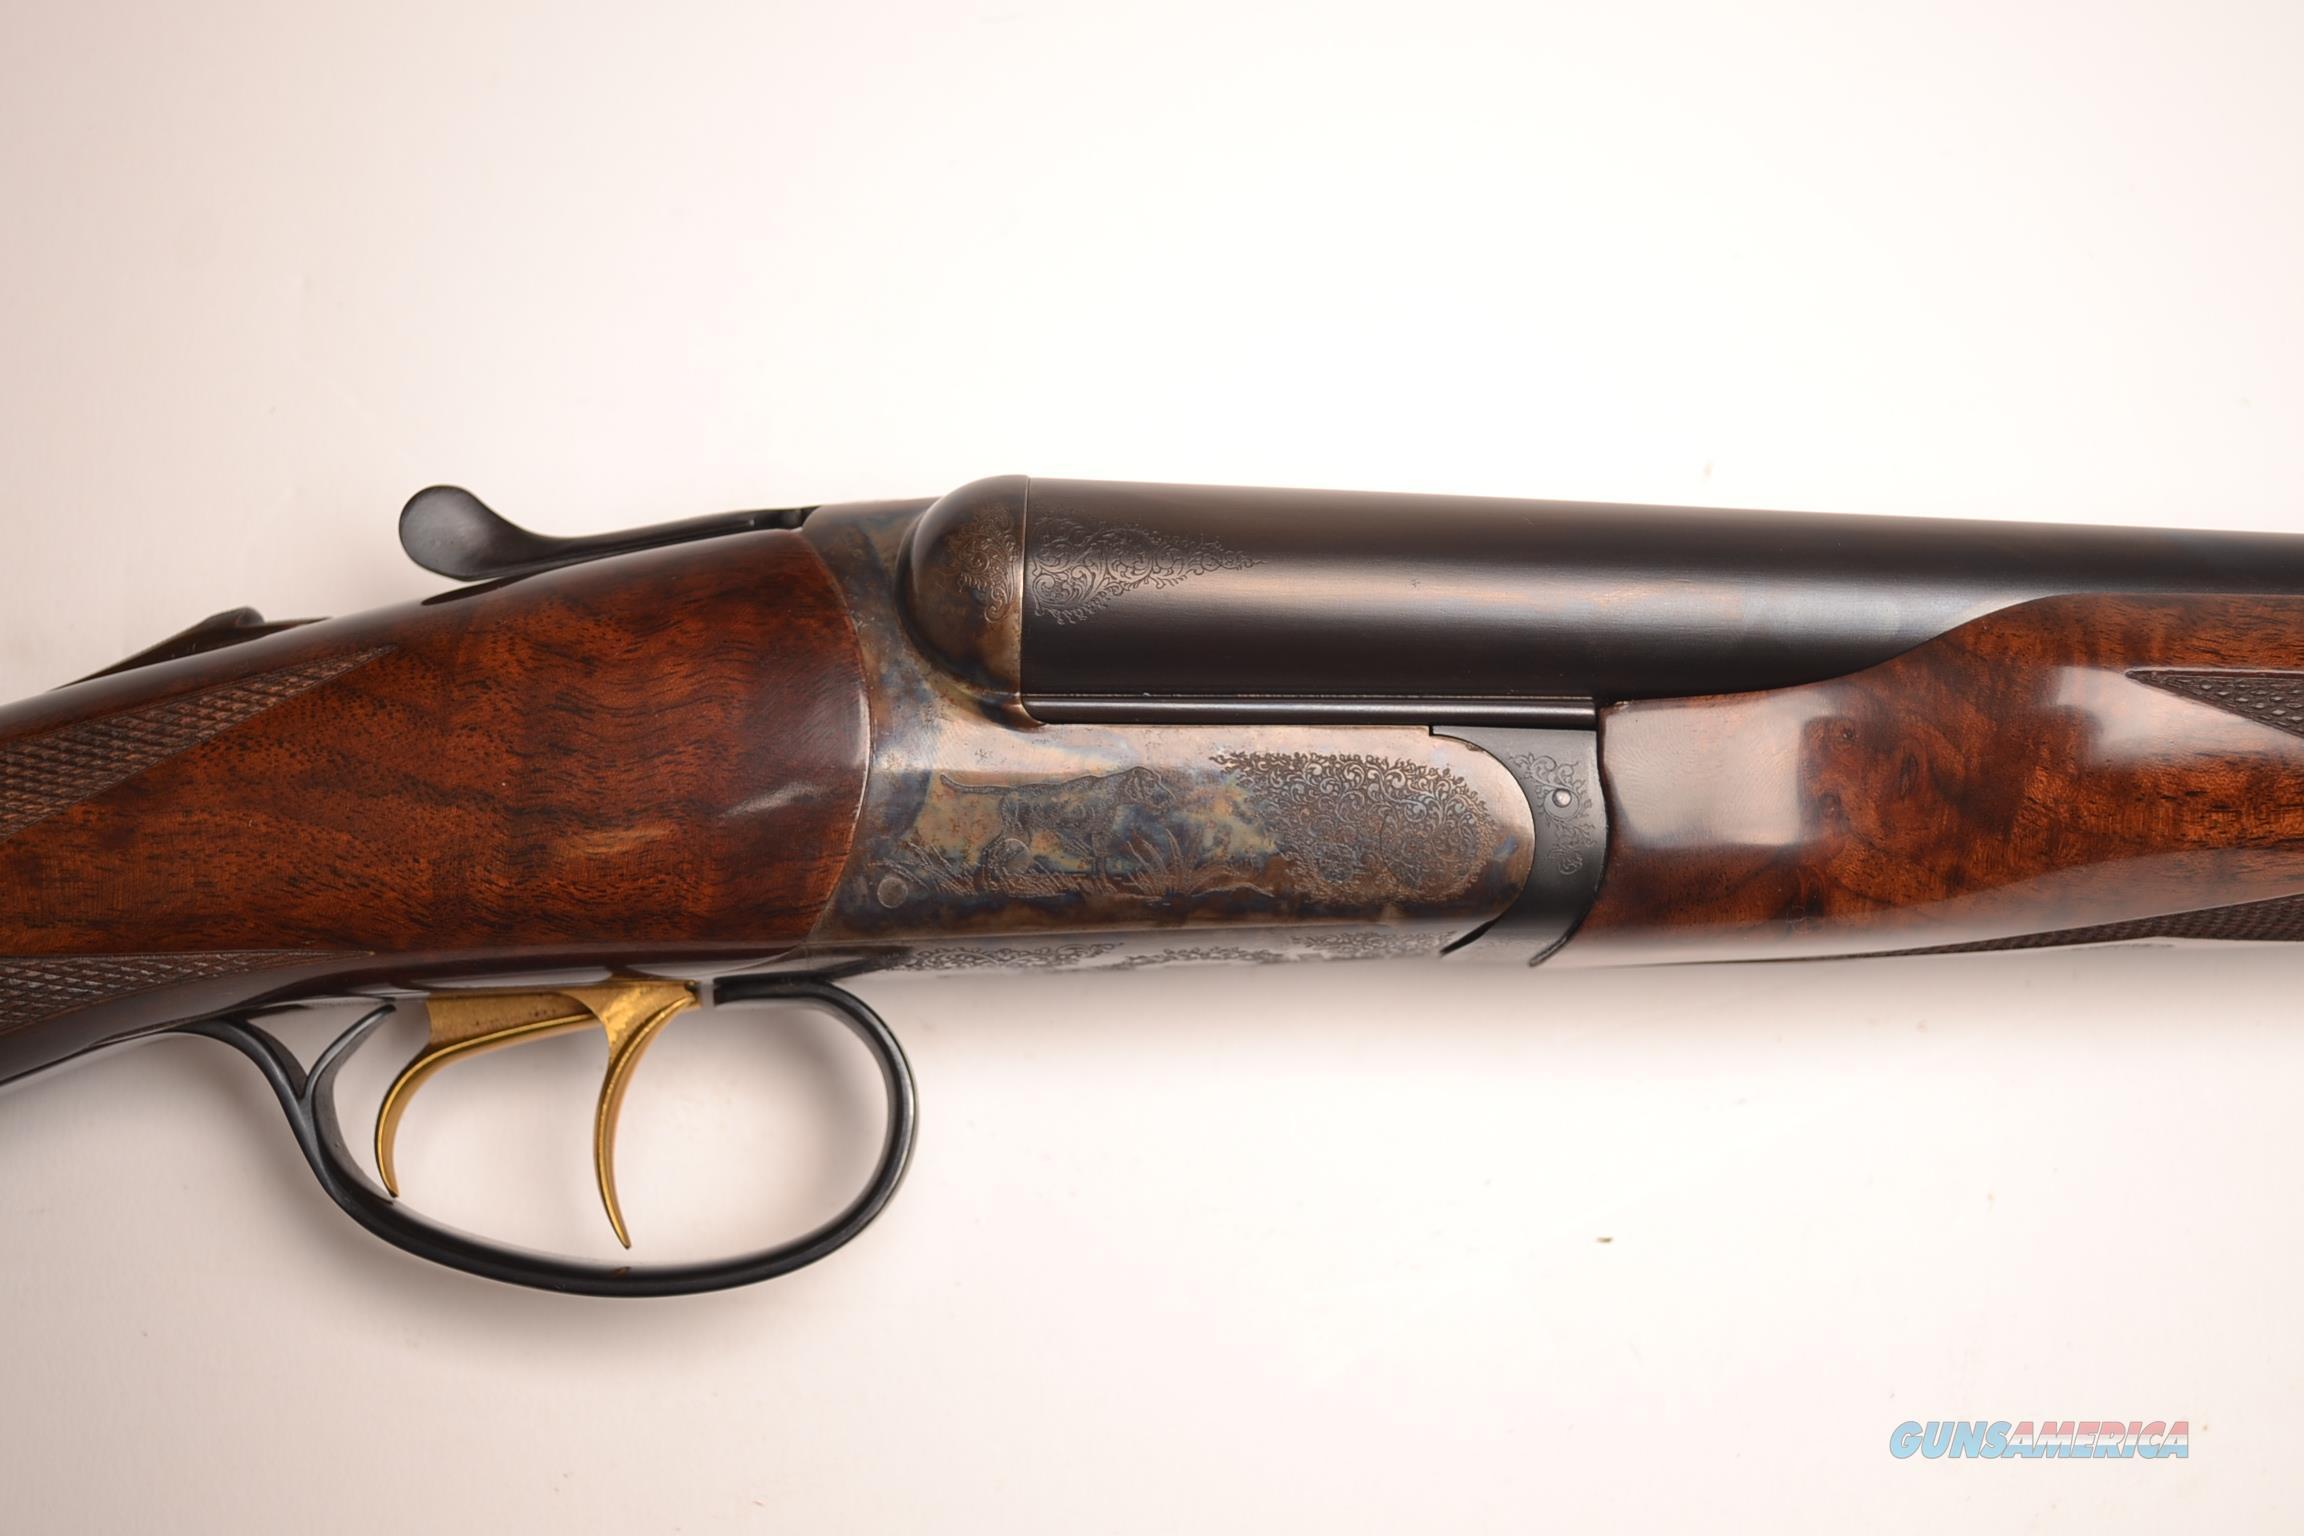 CSMC - RBL 16, 16ga.  Guns > Shotguns > Connecticut (Galazan) Shotguns